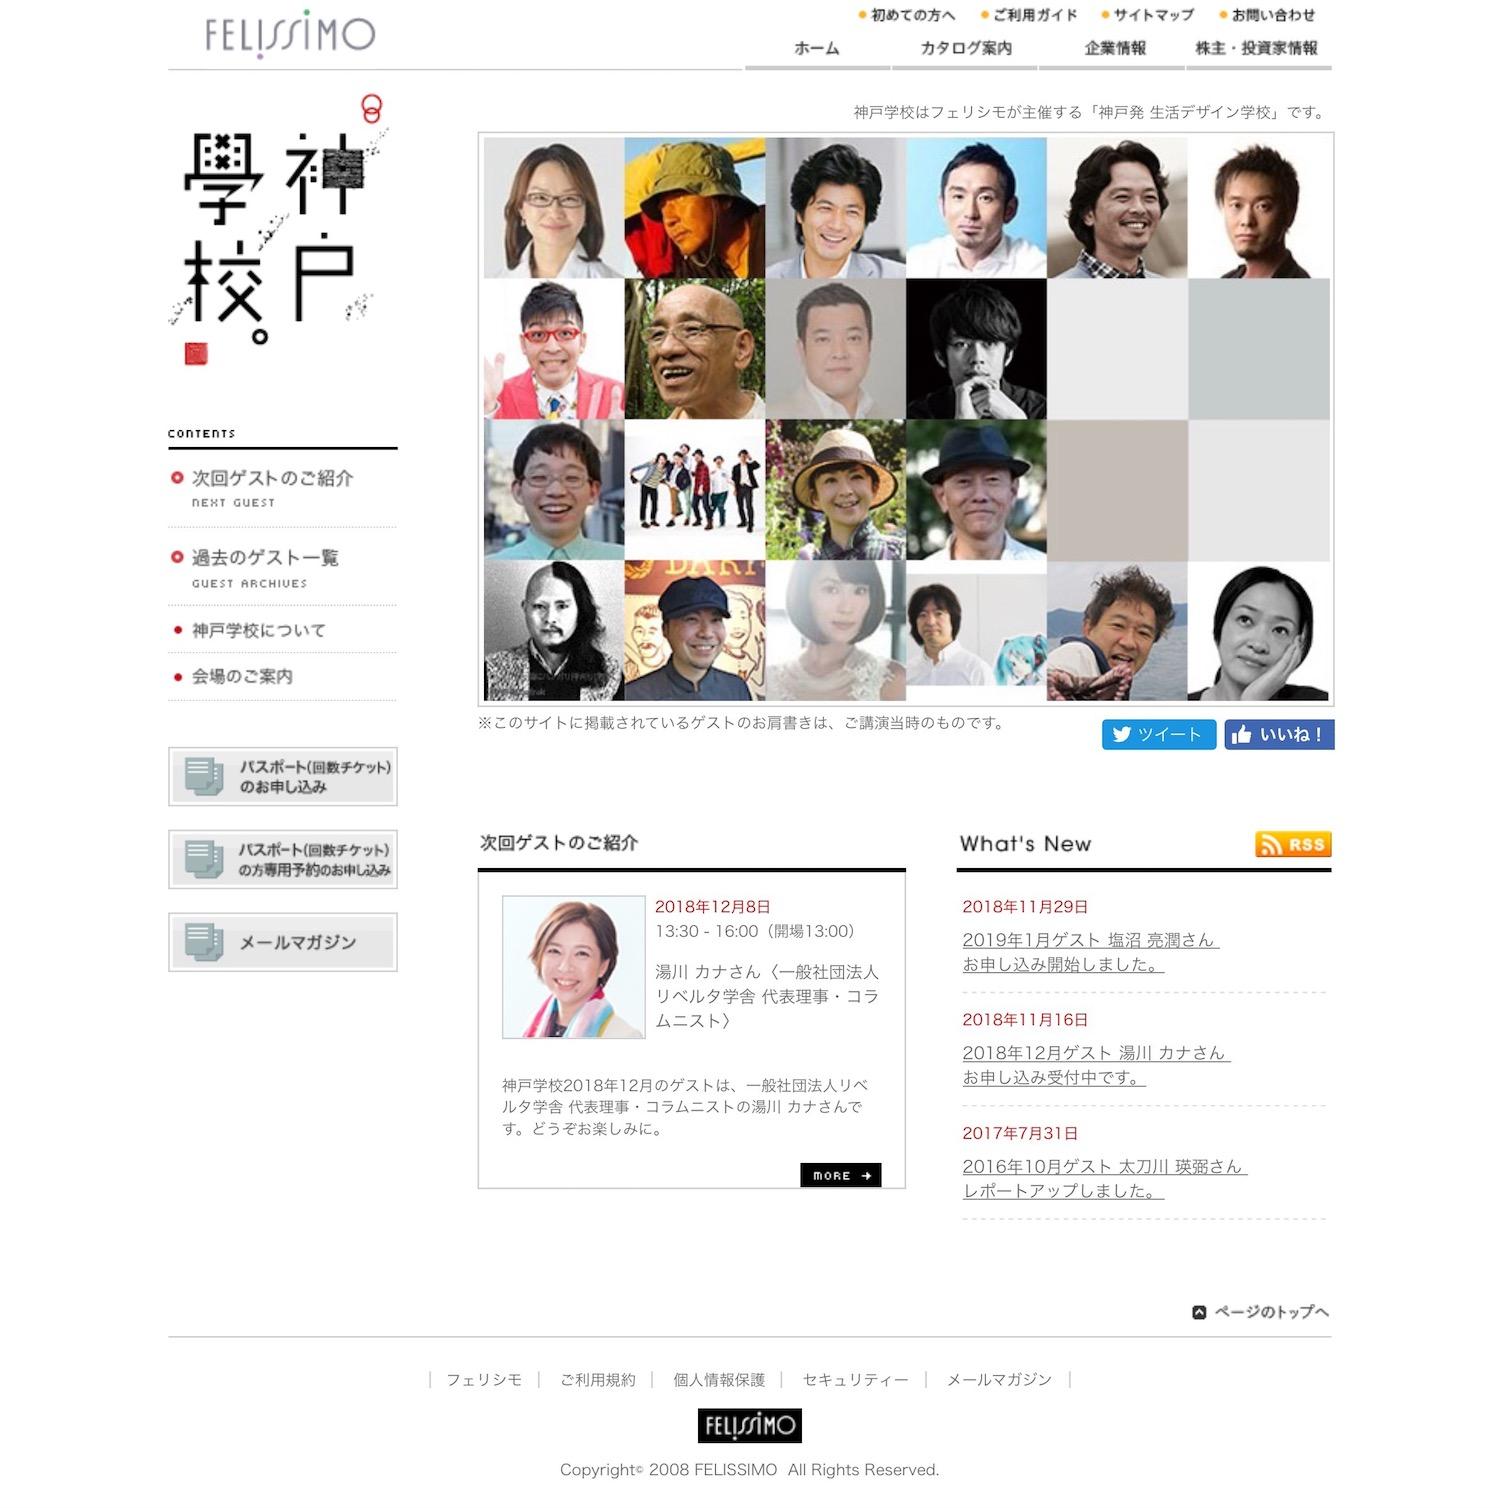 15.Ro 神戸学校1.JPG